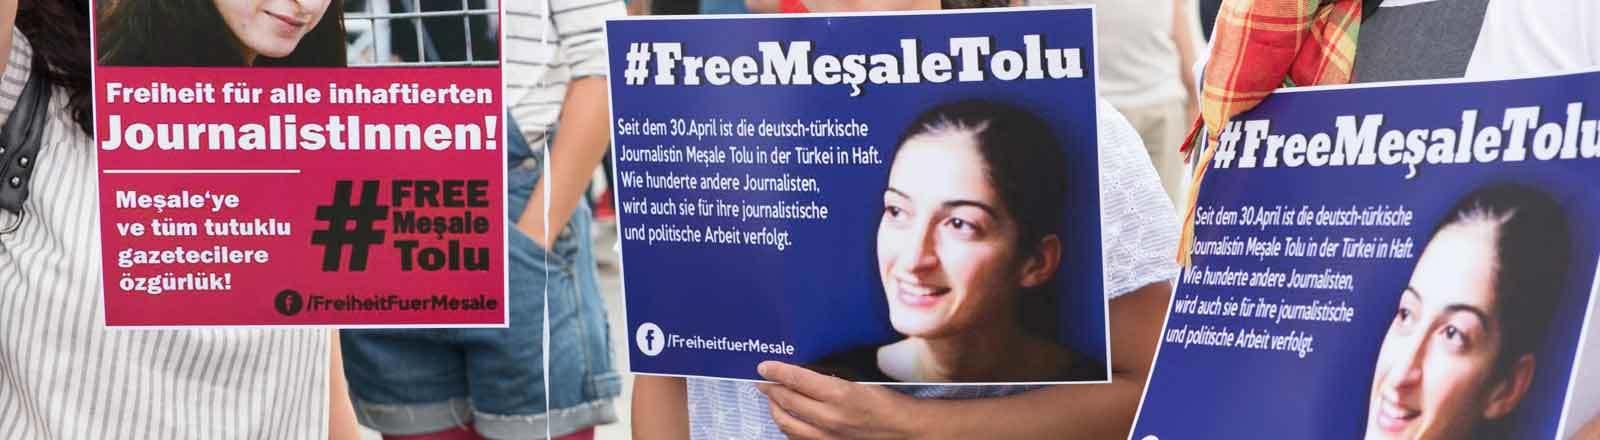 Transparente Free Mesale Tolu